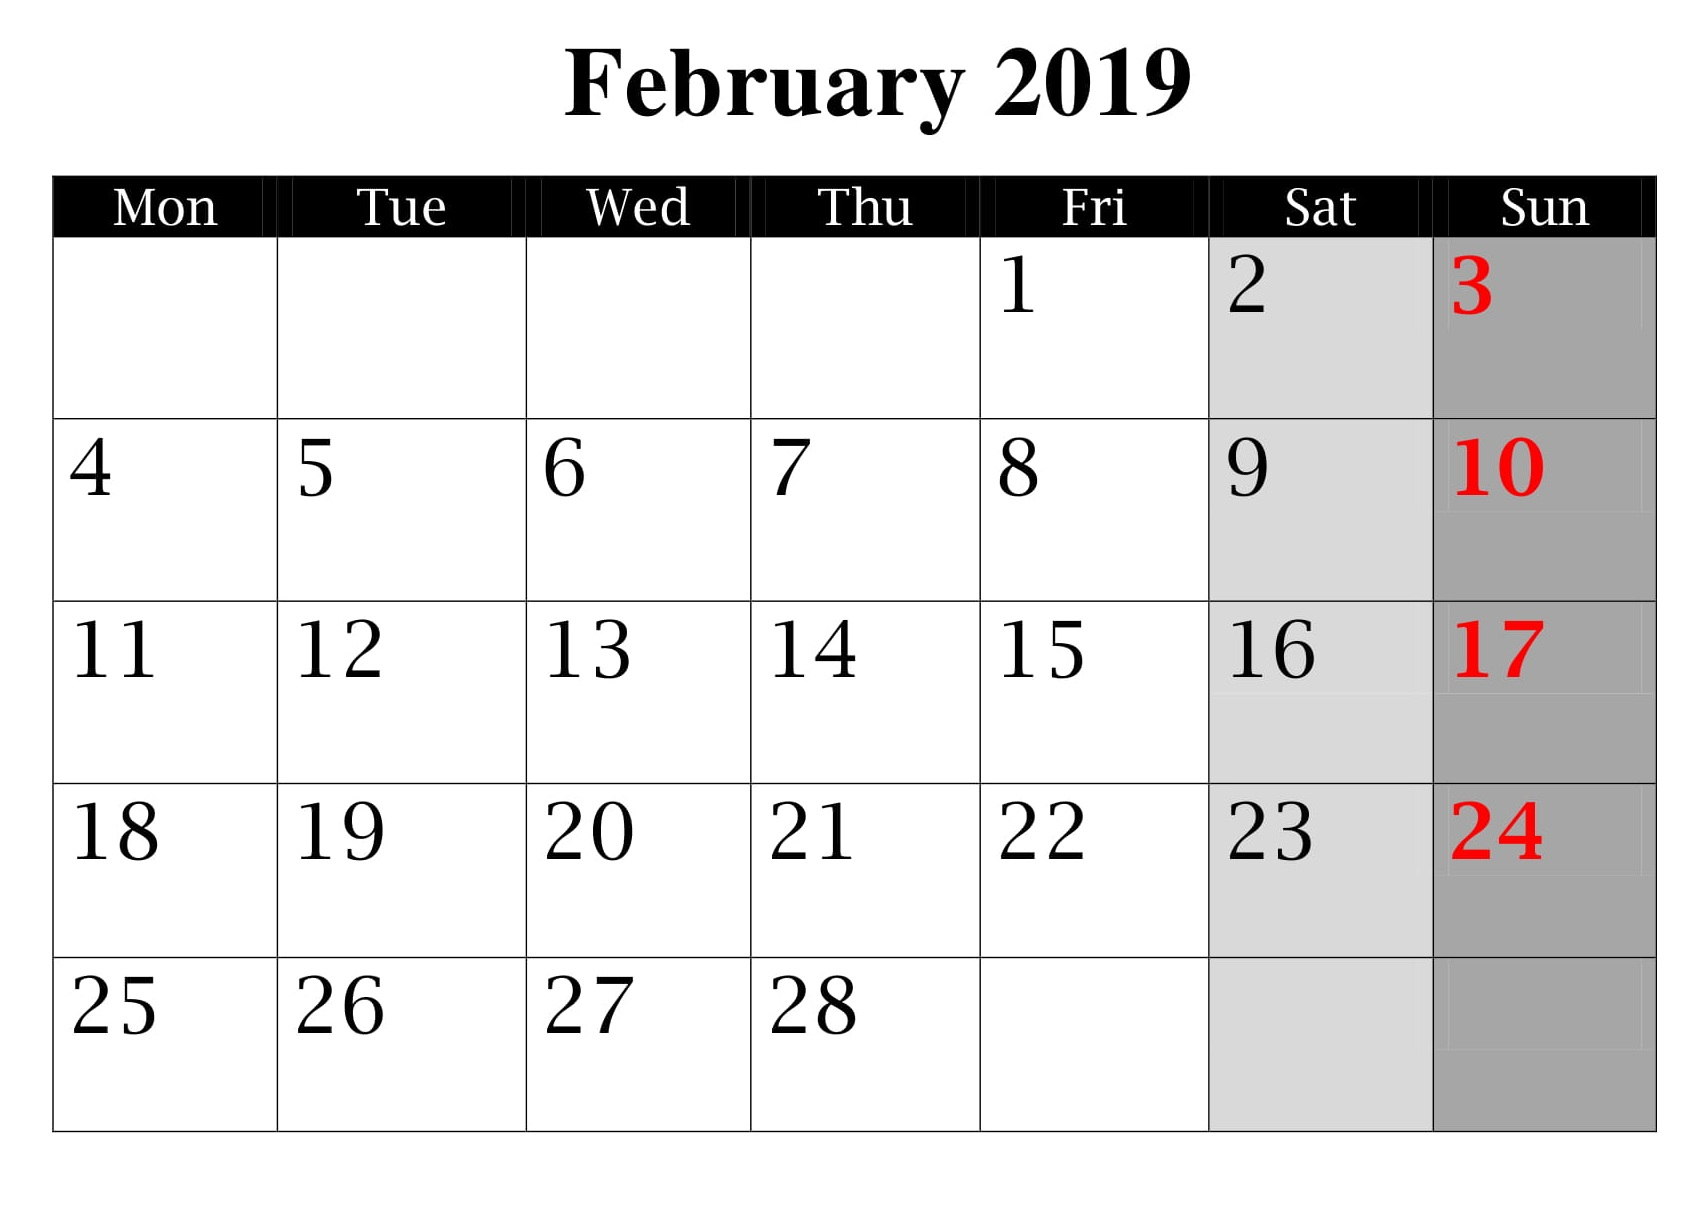 Calendar of February 2019 With Holidays